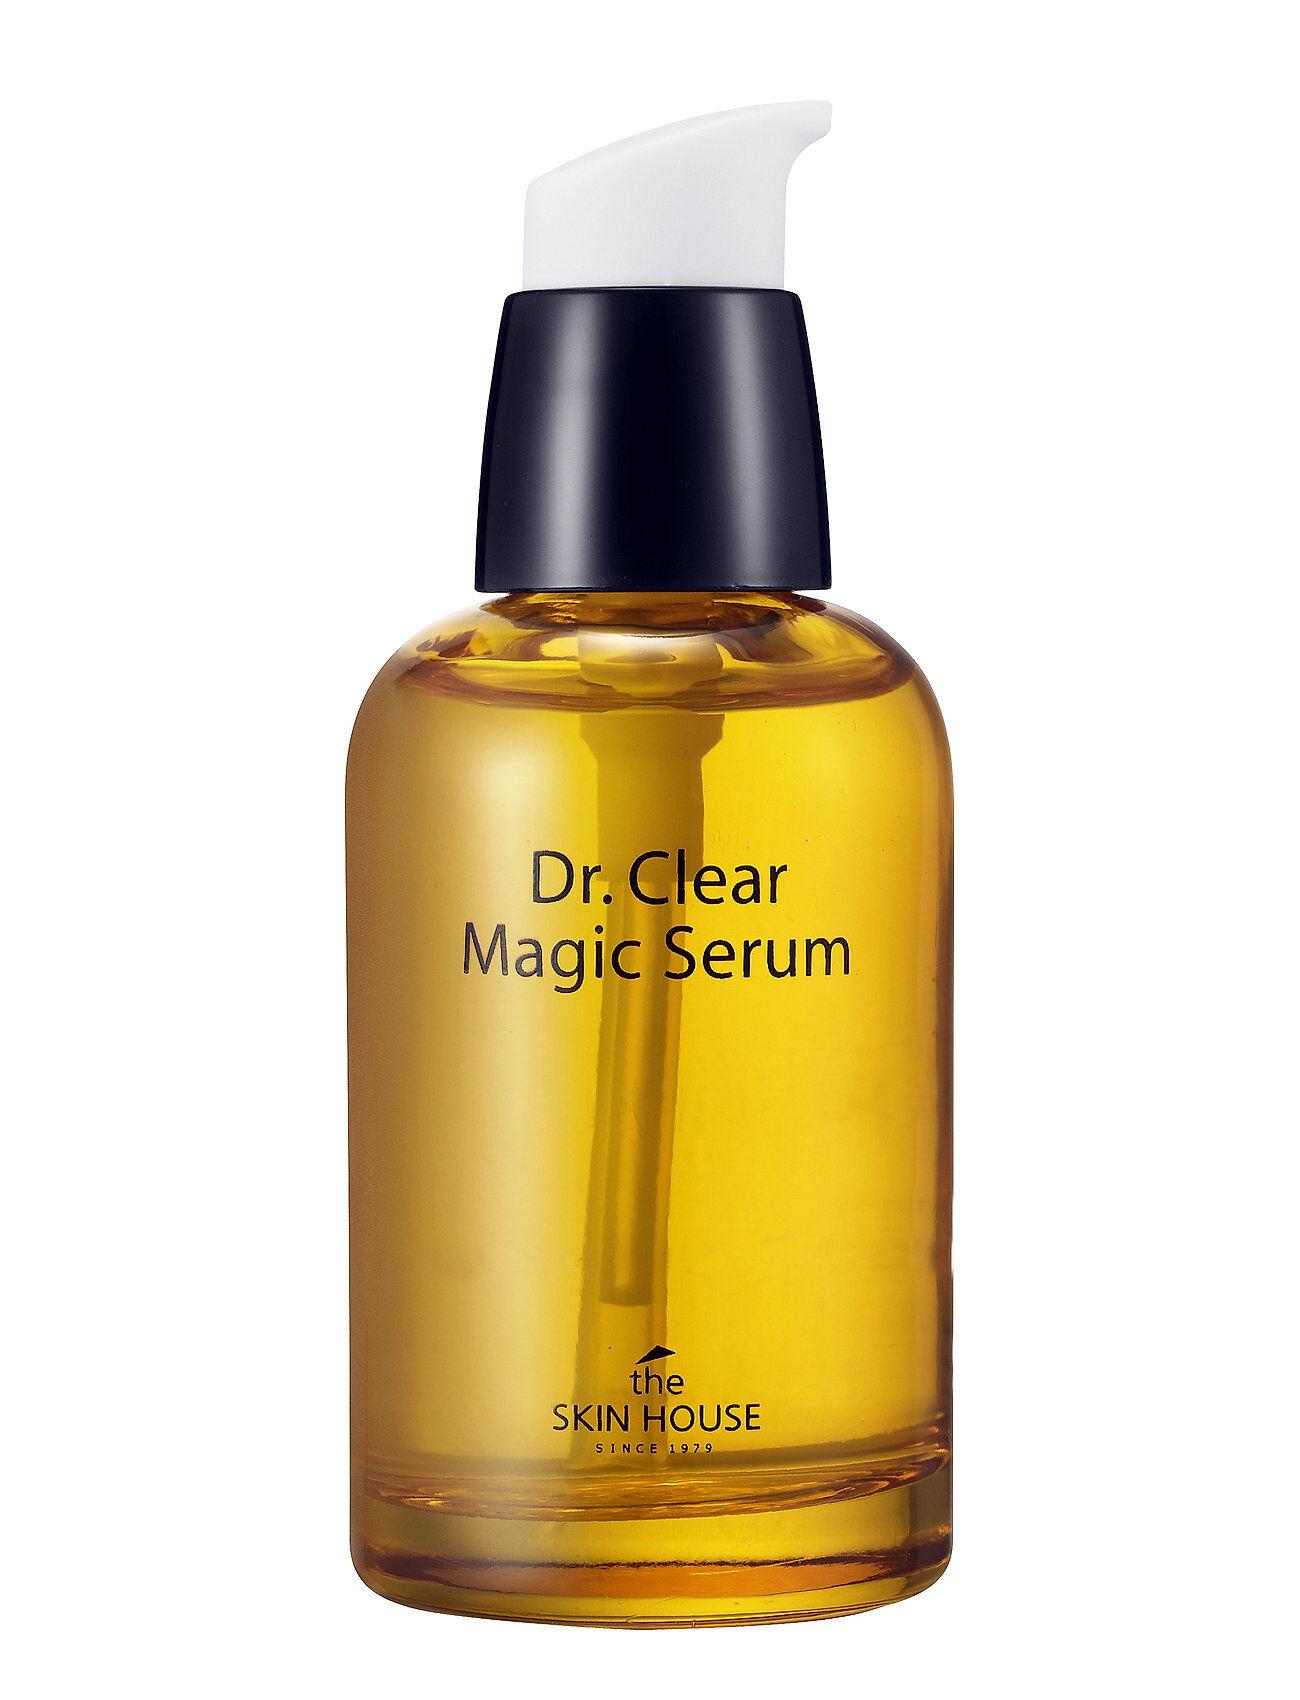 The Skin House Dr. Clear Magic Serum Seerumi Kasvot Ihonhoito Nude THE SKIN HOUSE